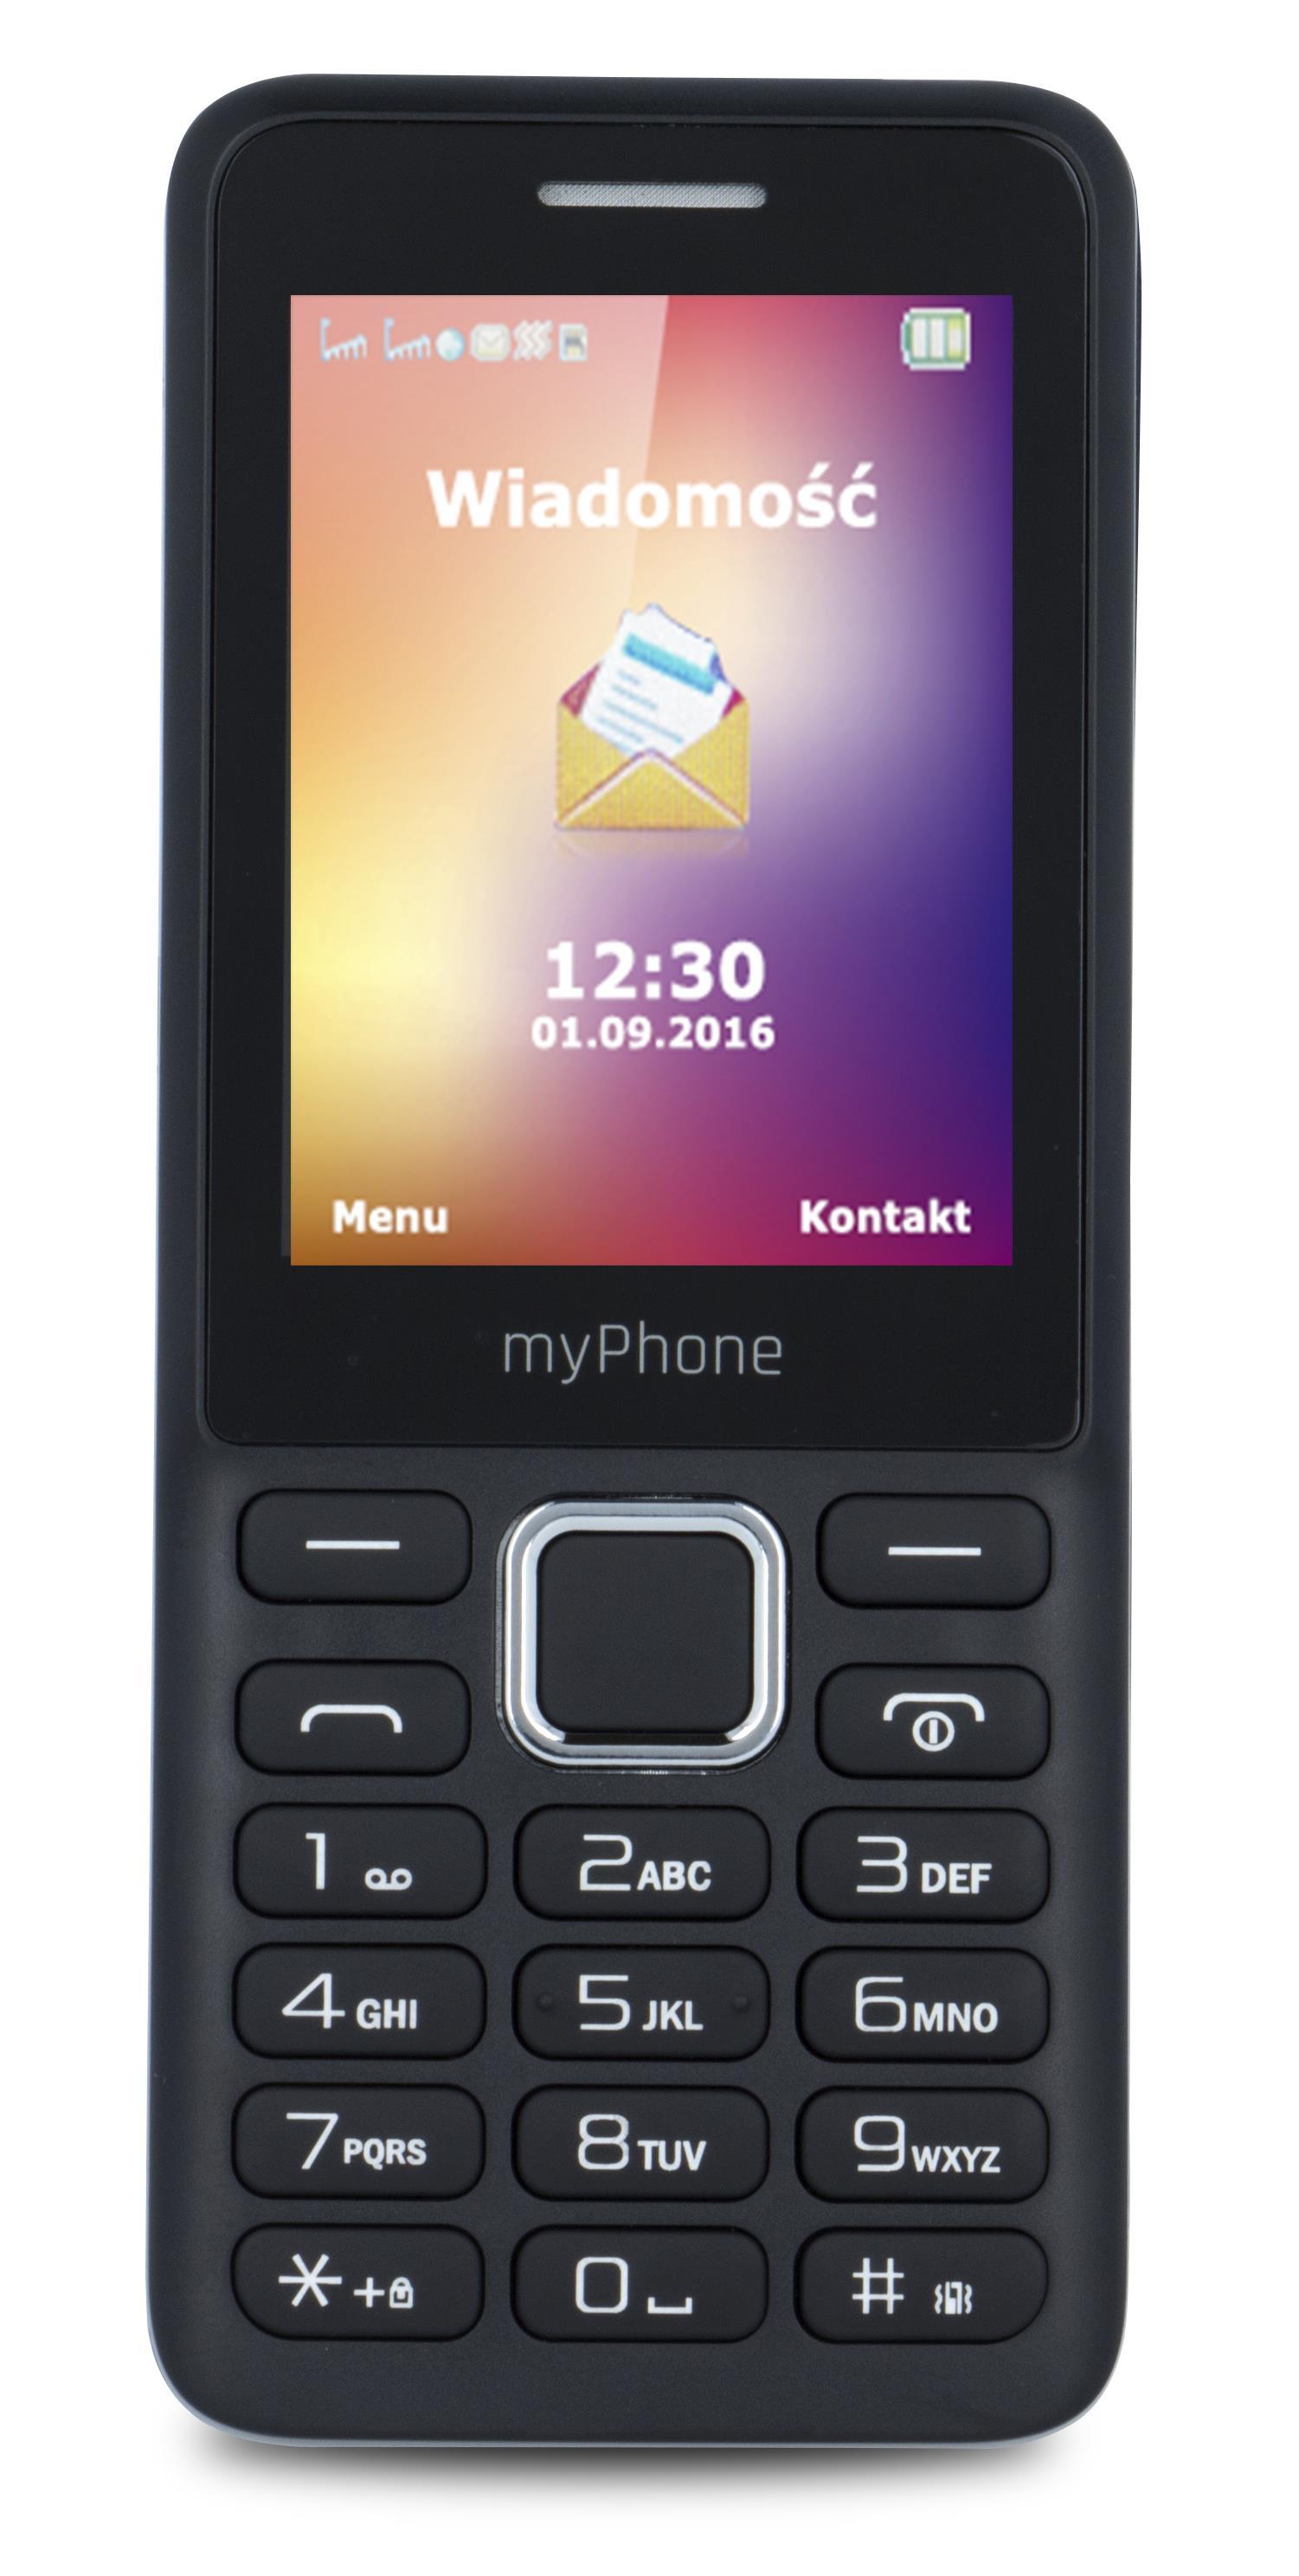 TELEFON DUAL SIM myPhone 6310 ČERNÝ